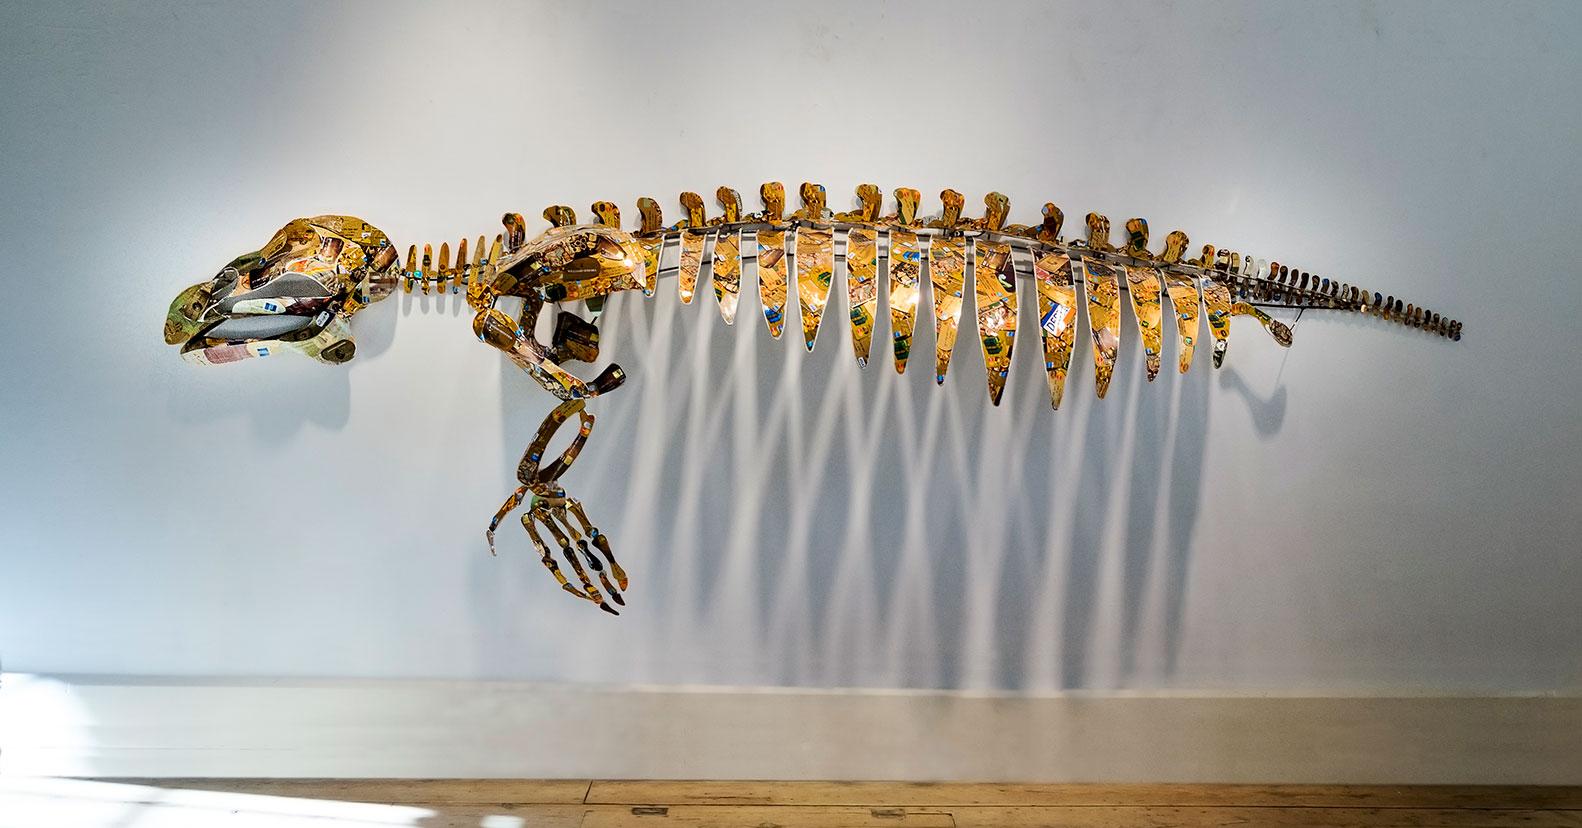 Manatee sculpture by Christy Rupp